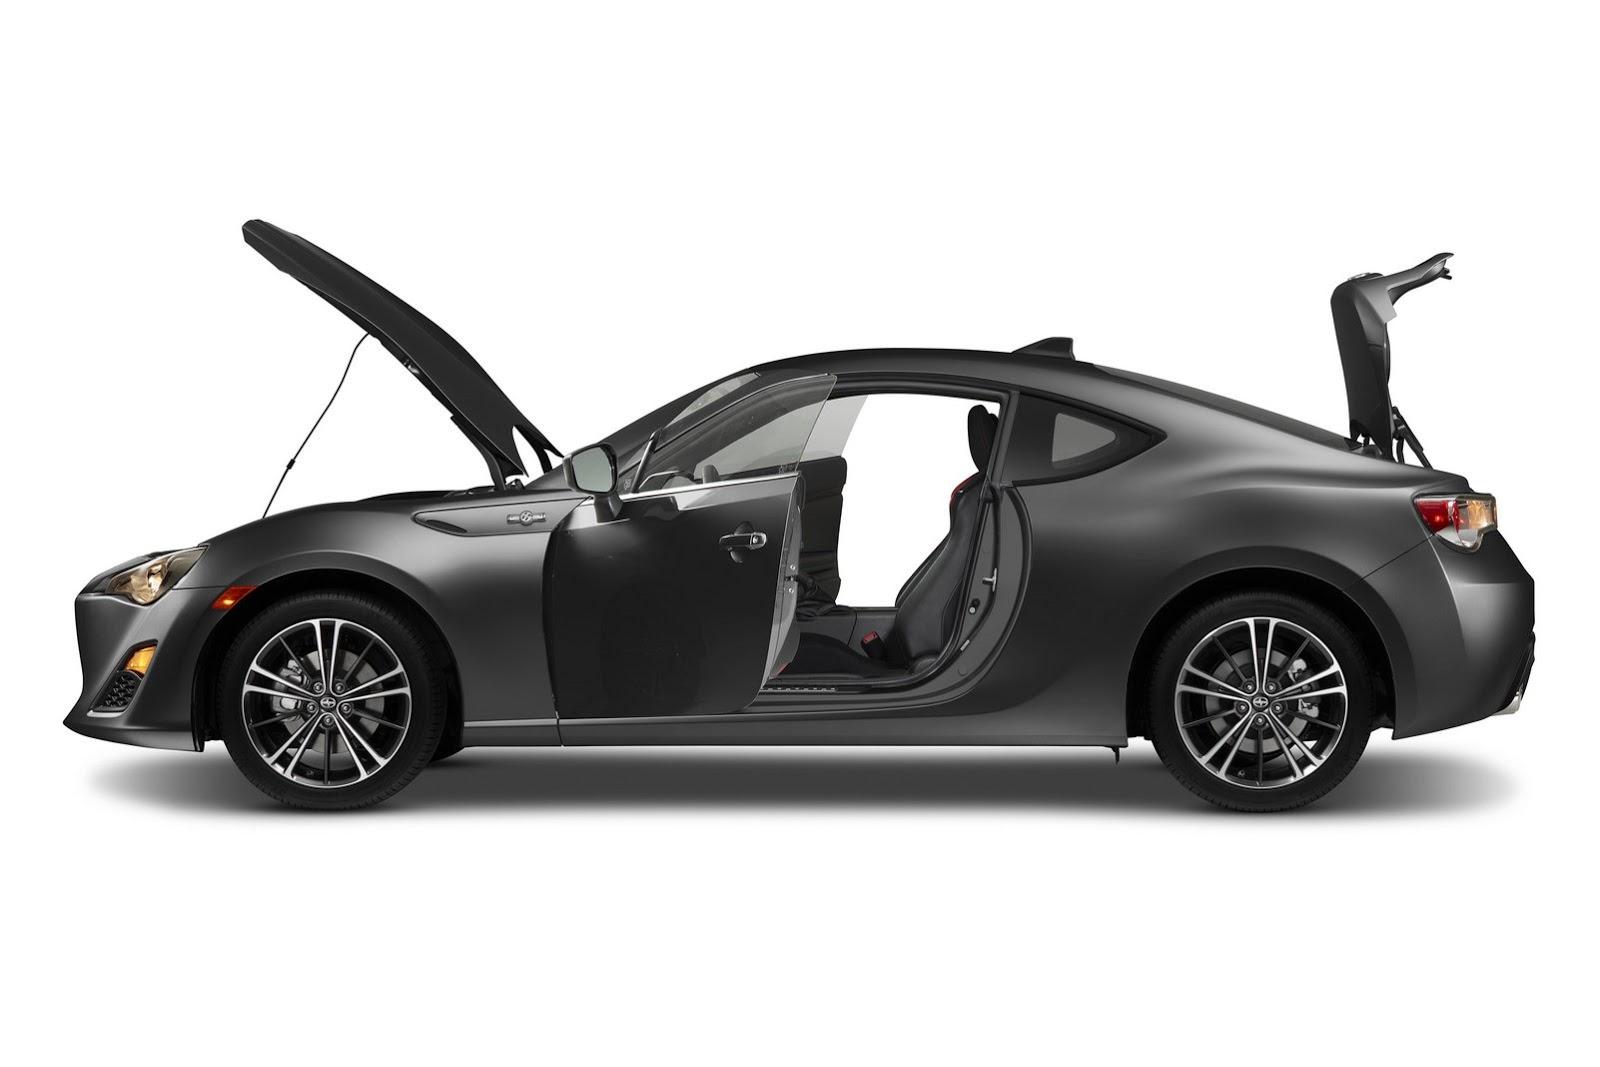 toyota subaru scion lightweight sports car toyota gt86 subaru brz scion frs page 198. Black Bedroom Furniture Sets. Home Design Ideas